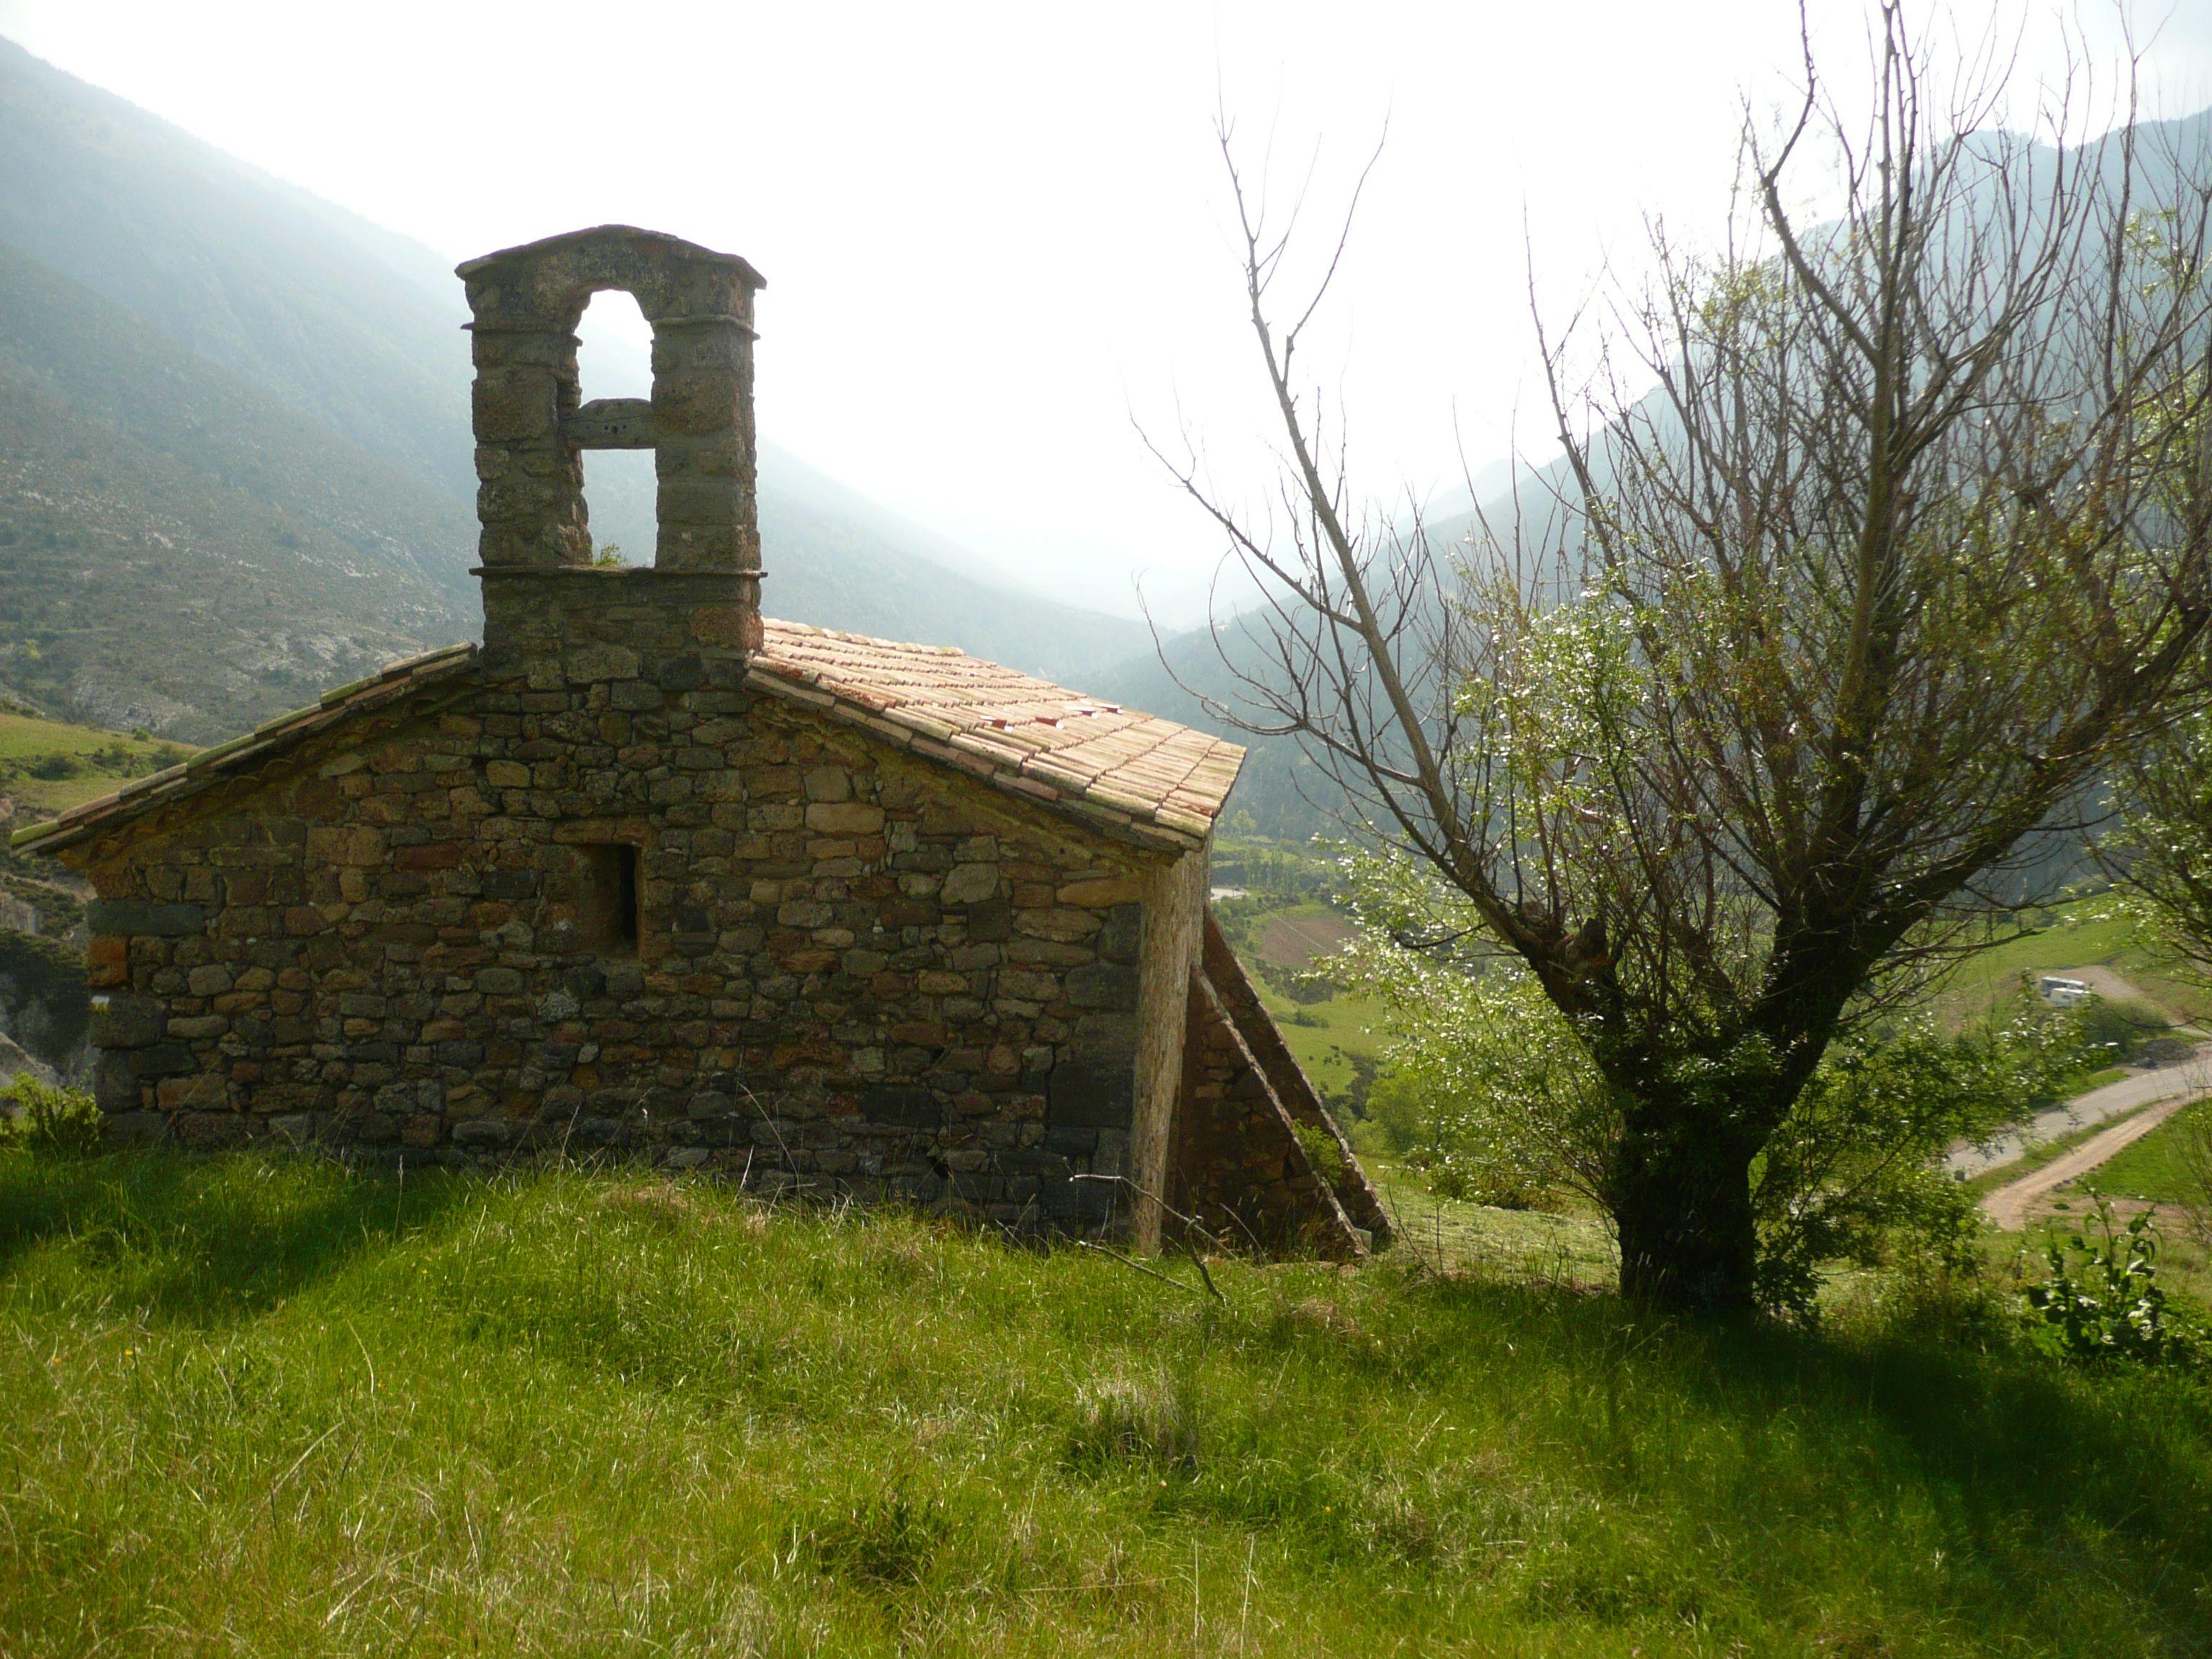 Ermita de Santa Maria, Josa de Cadí.